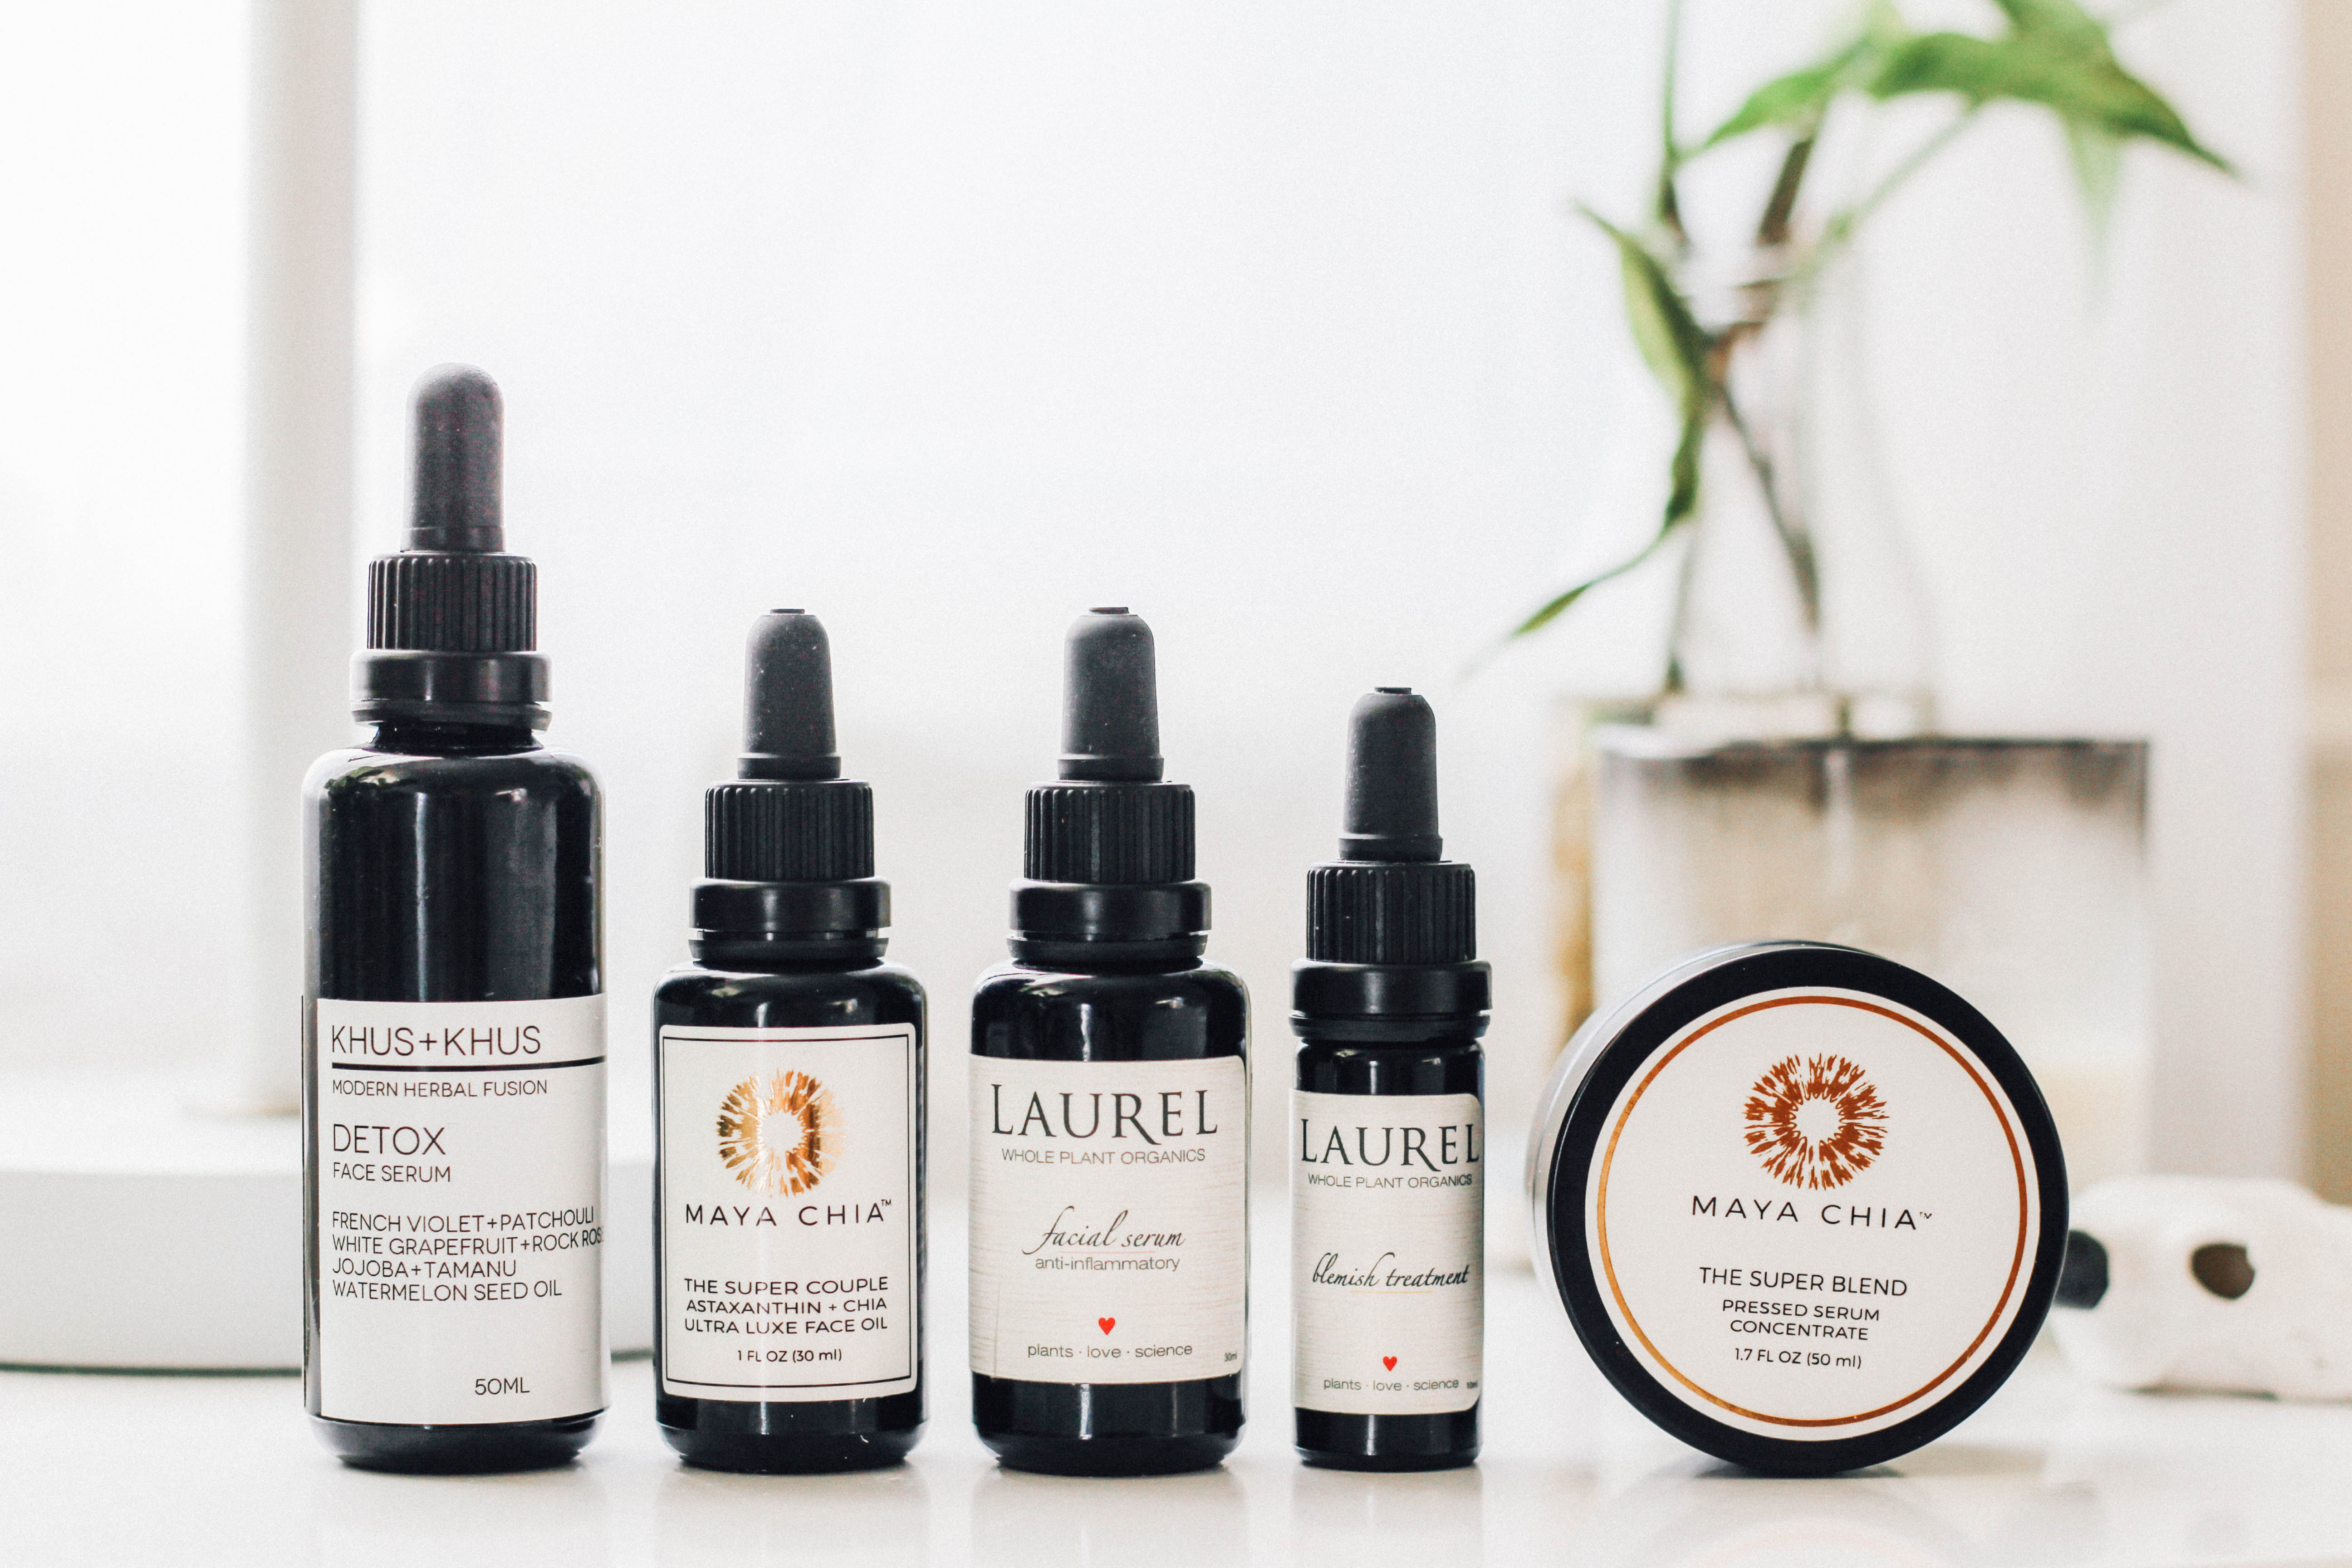 Organic serum, face oil and blemish treatment